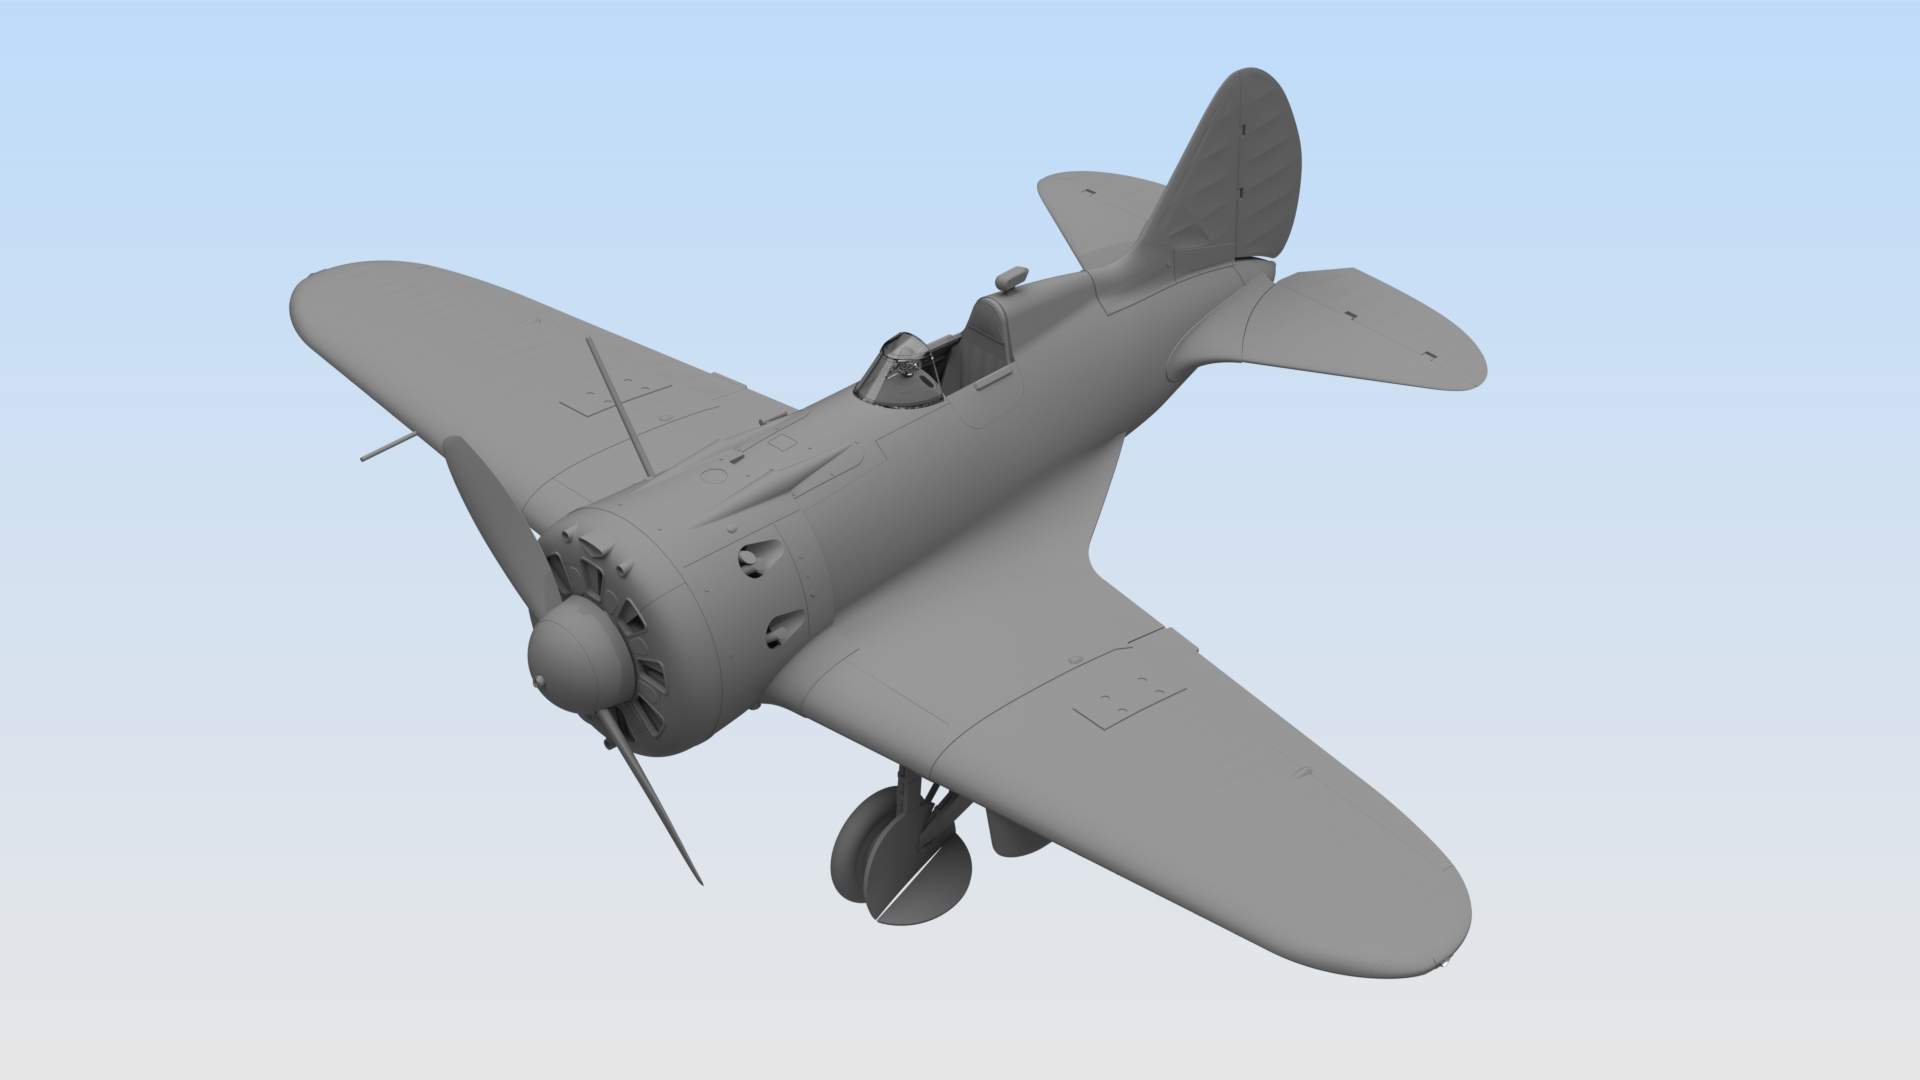 1/32 32003 И-16 тип 29, Советский истребитель ІІ МВ \ I-16 type 29, WWII Soviet Fighter